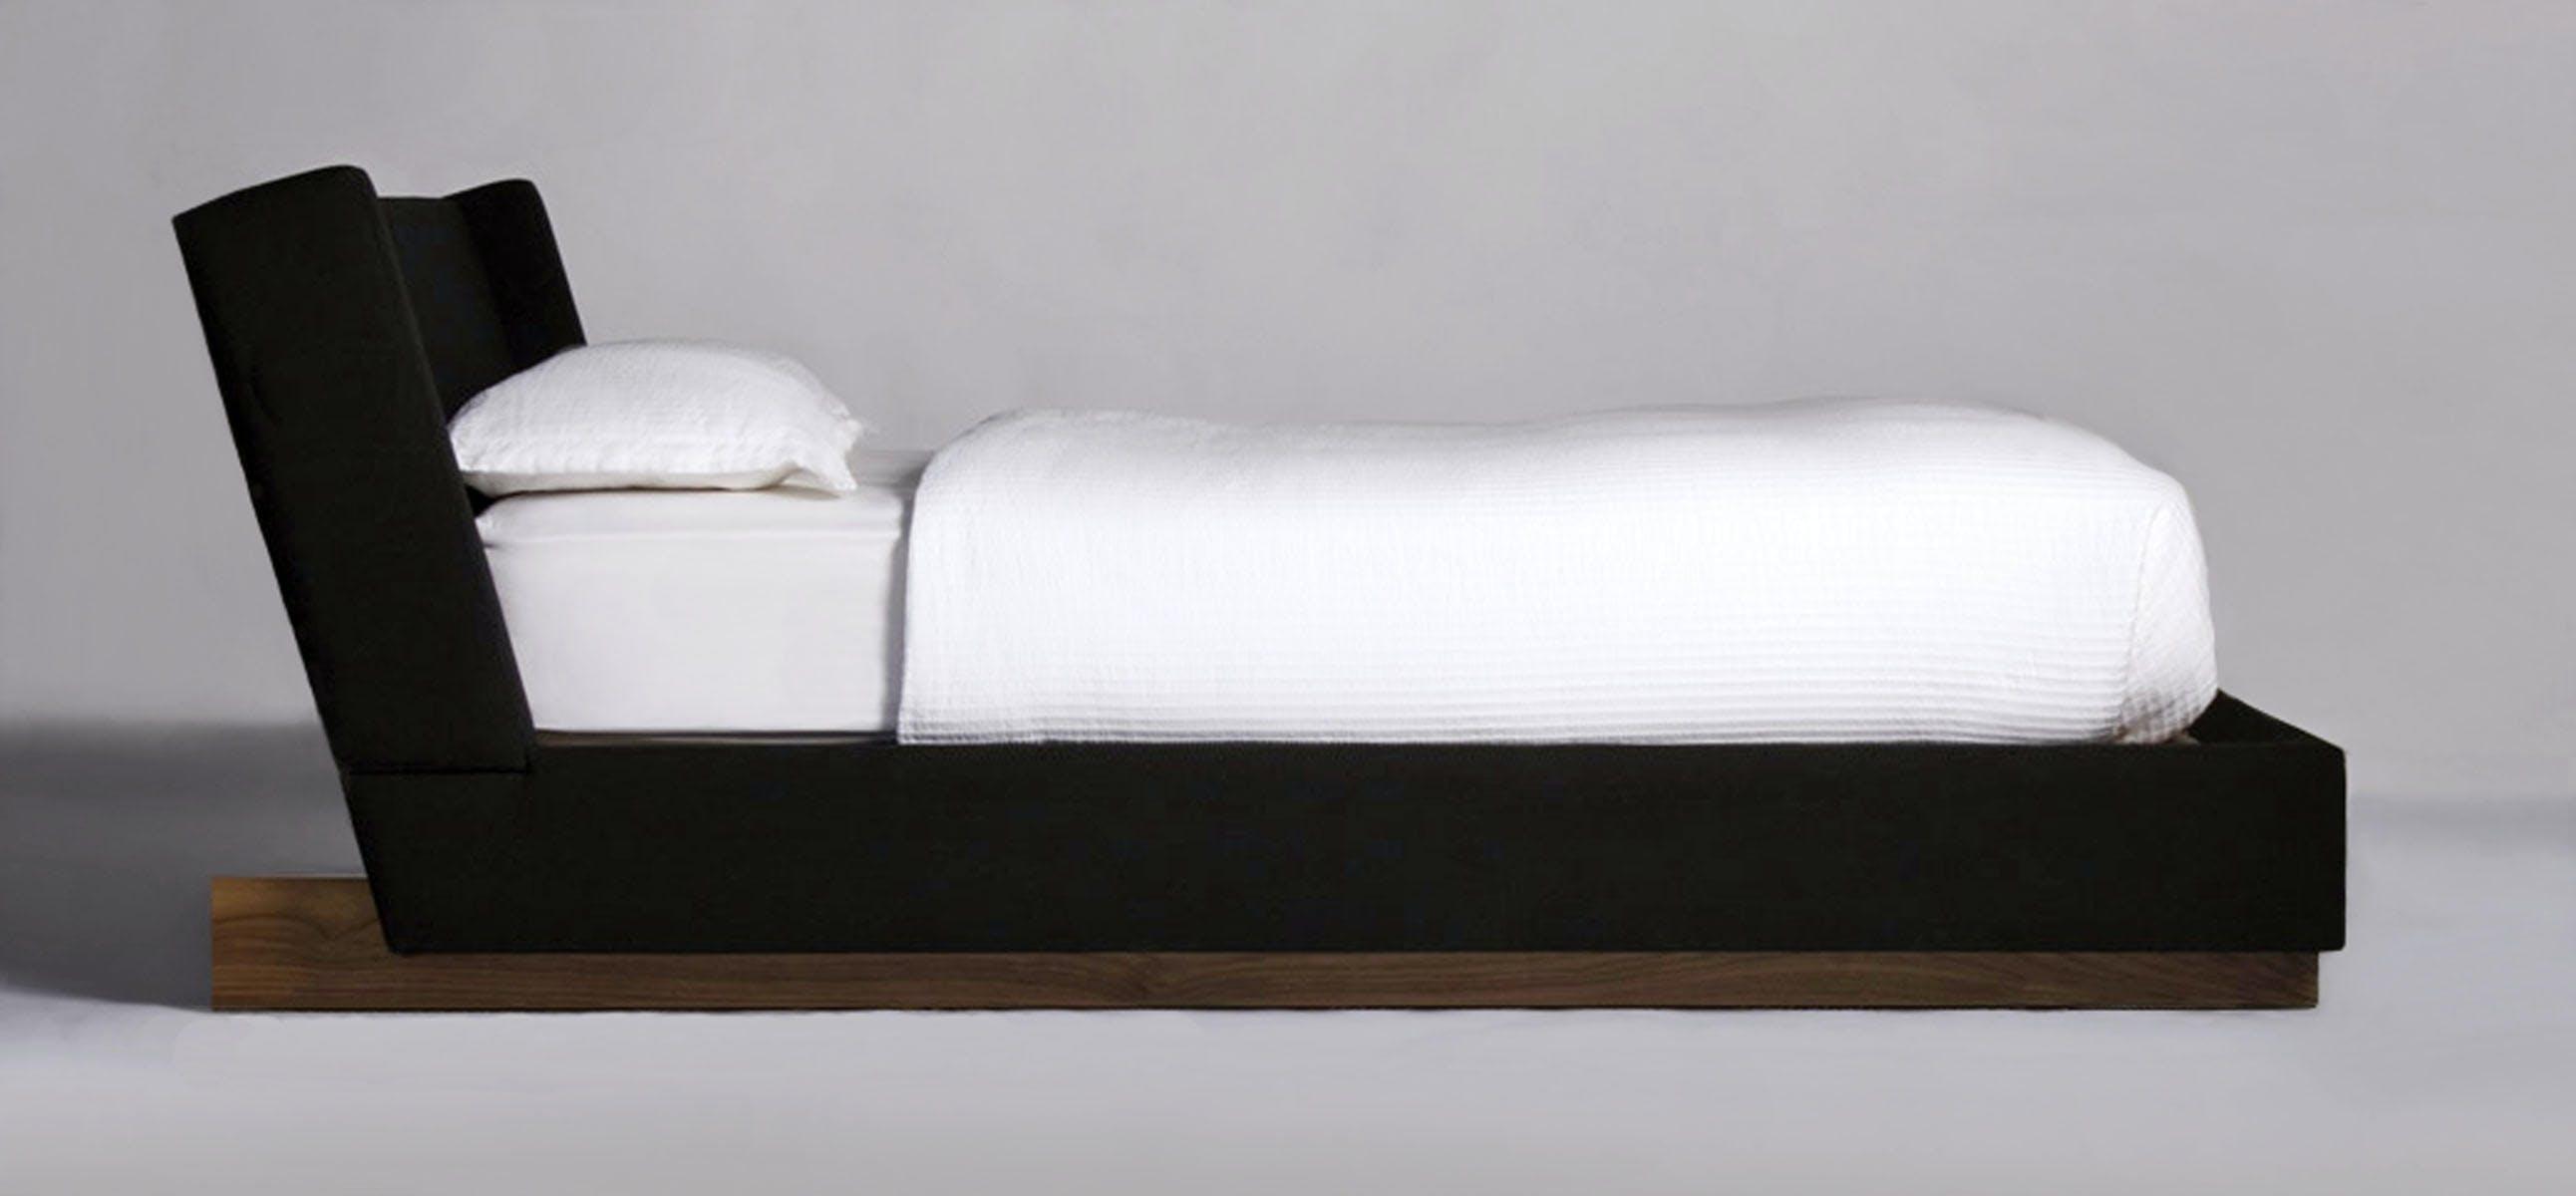 Trax Bed Edit Profile